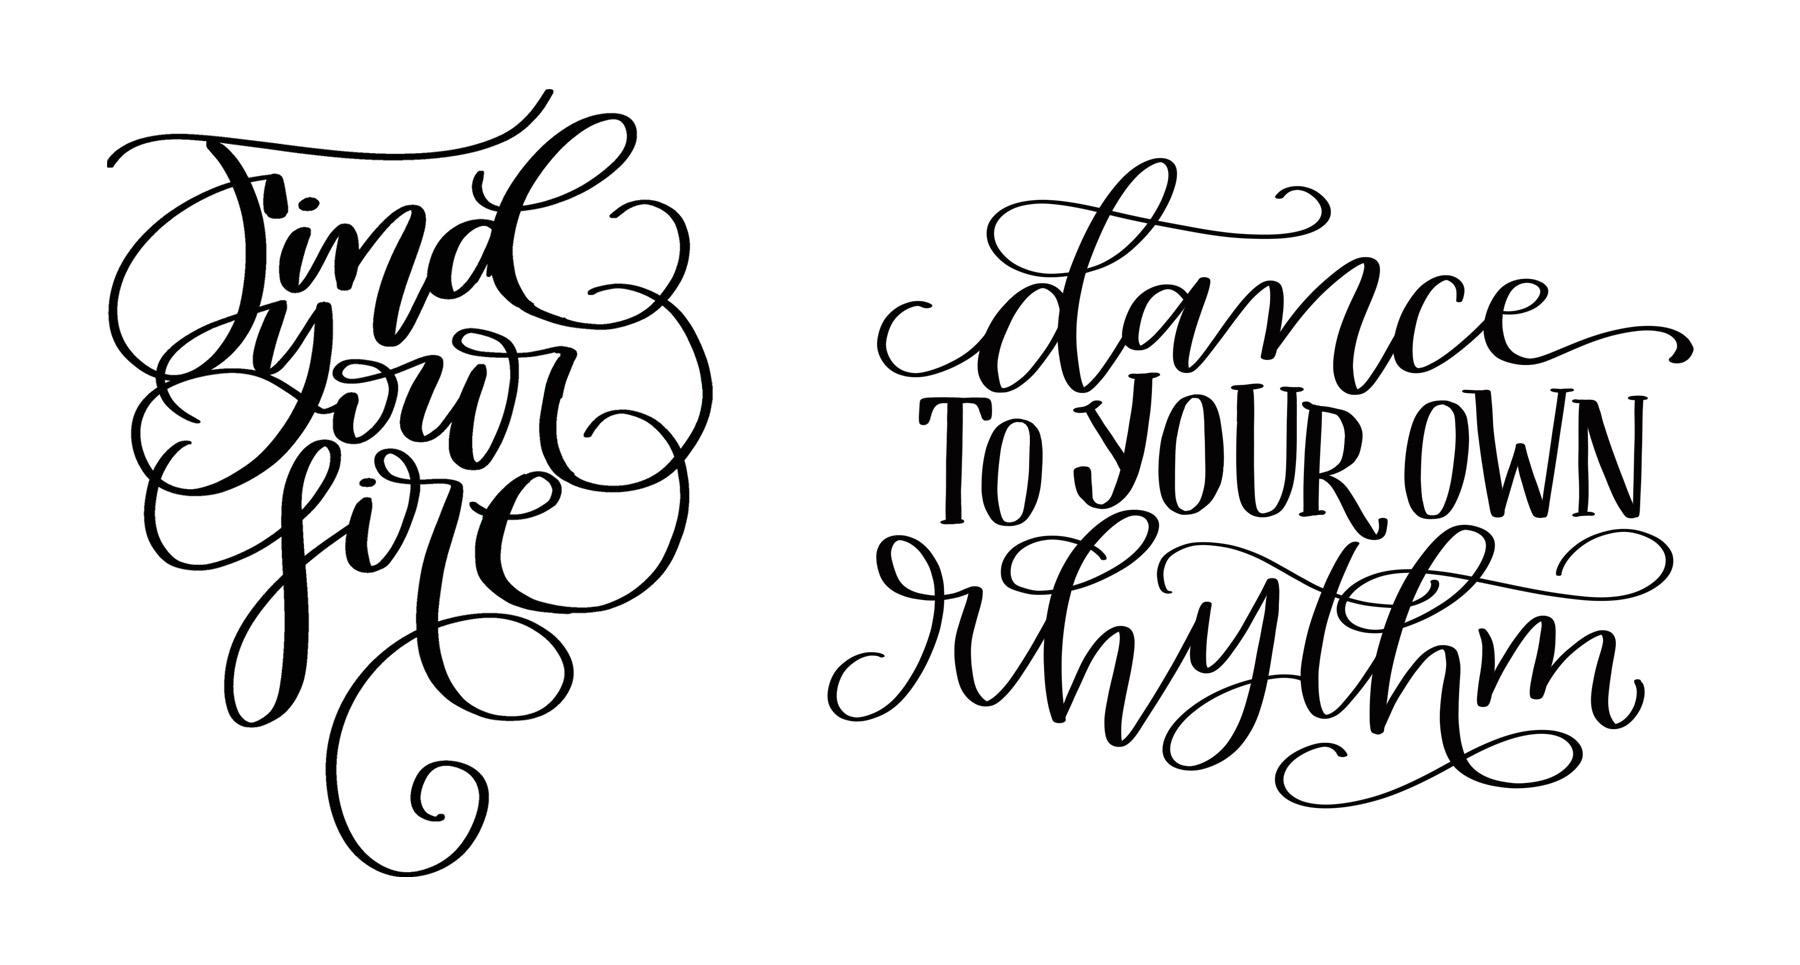 repapered_calligraphy_Improvement.jpg